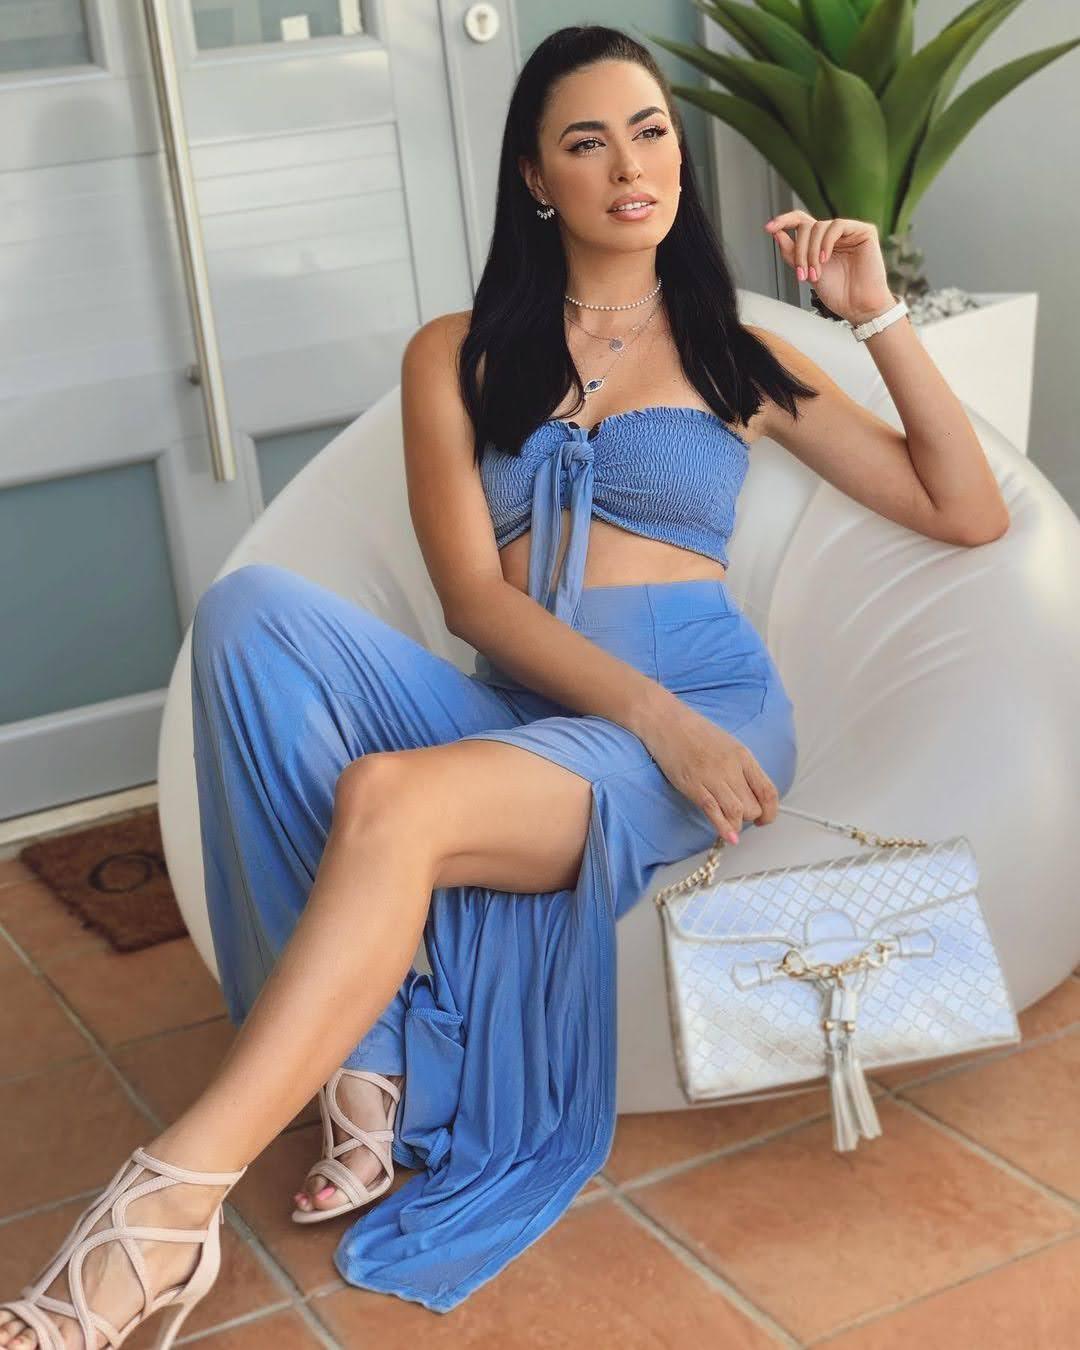 Nicole Marie  biography